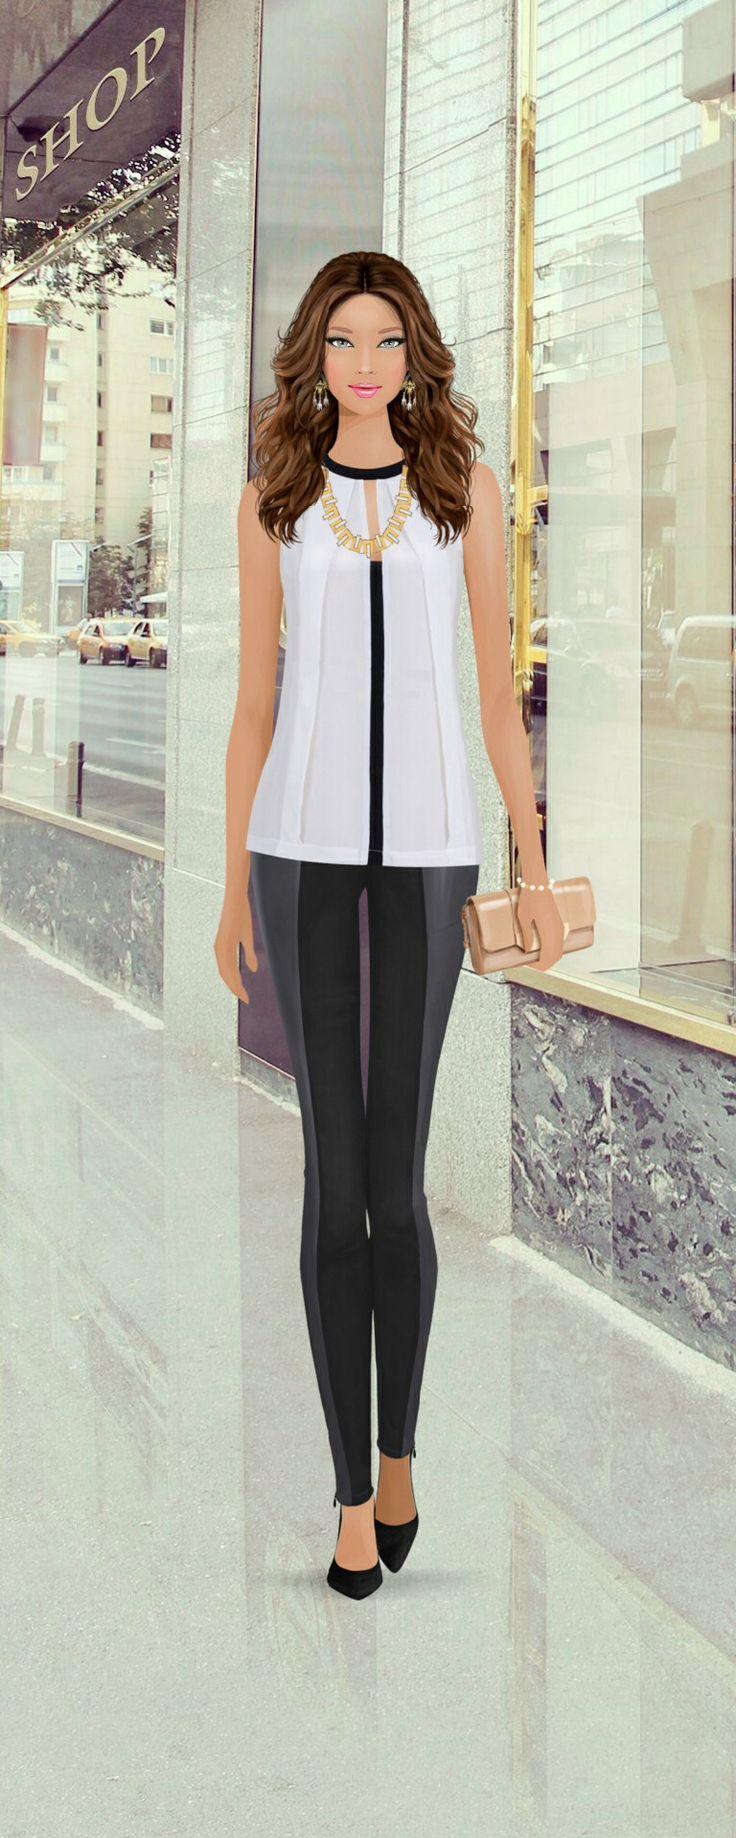 Rambla De Catalunya Street Shopping Covet Fashion Game Pinterest